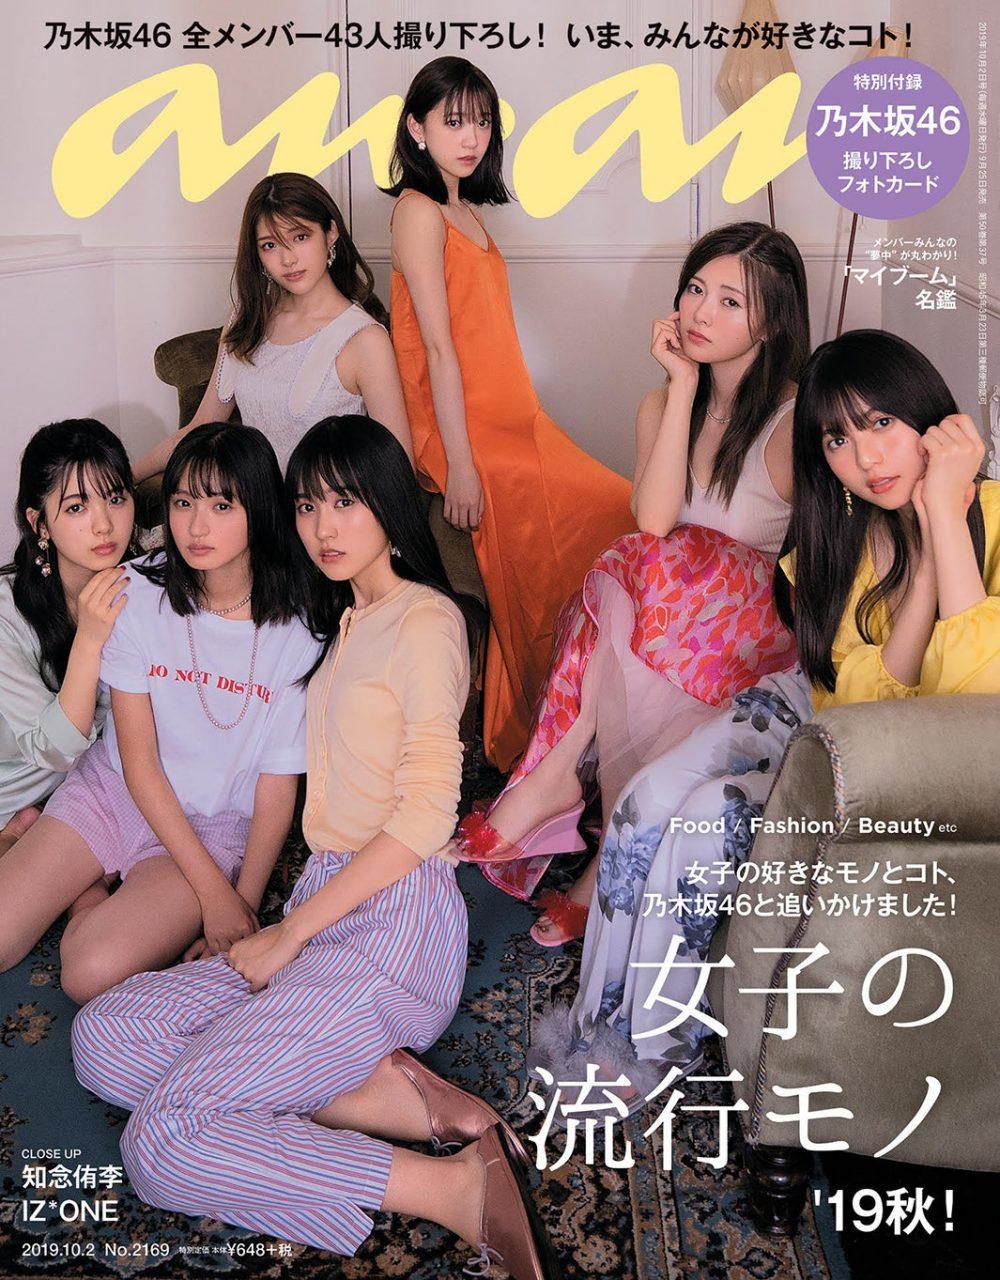 anan No.2169 2019年10月2日号